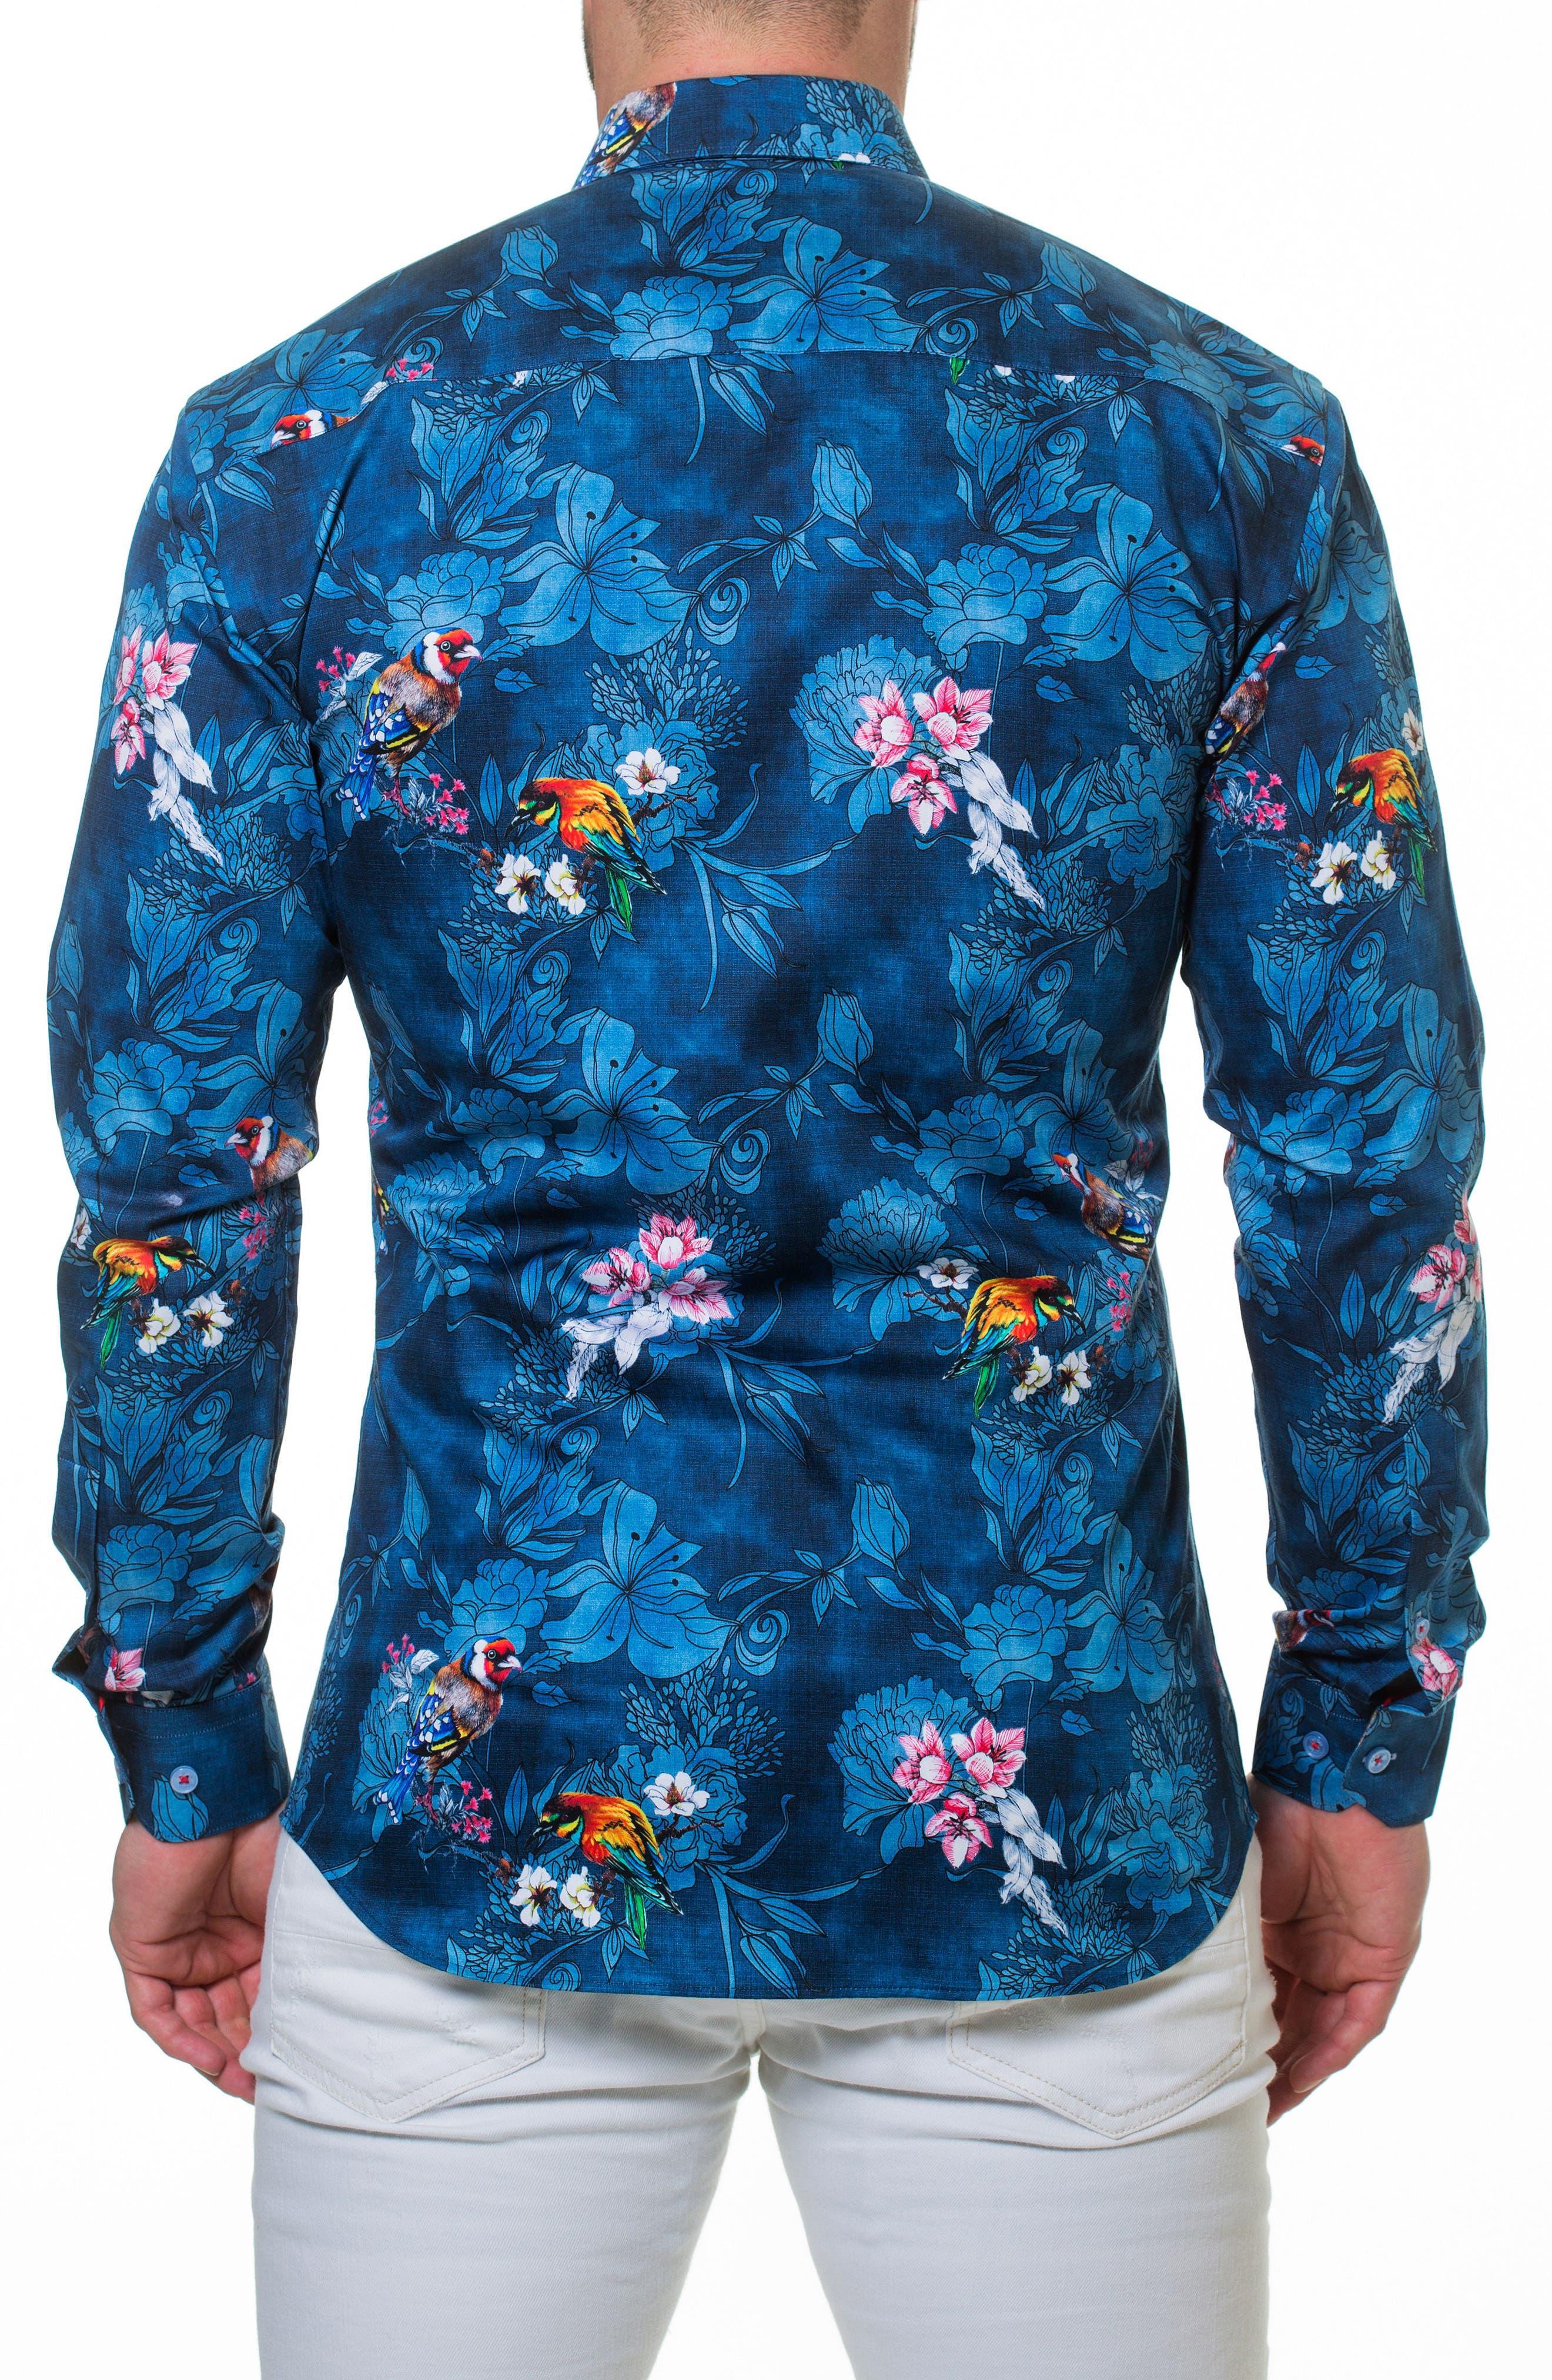 Wall Street Blossom Blue Sport Shirt,                             Alternate thumbnail 2, color,                             420